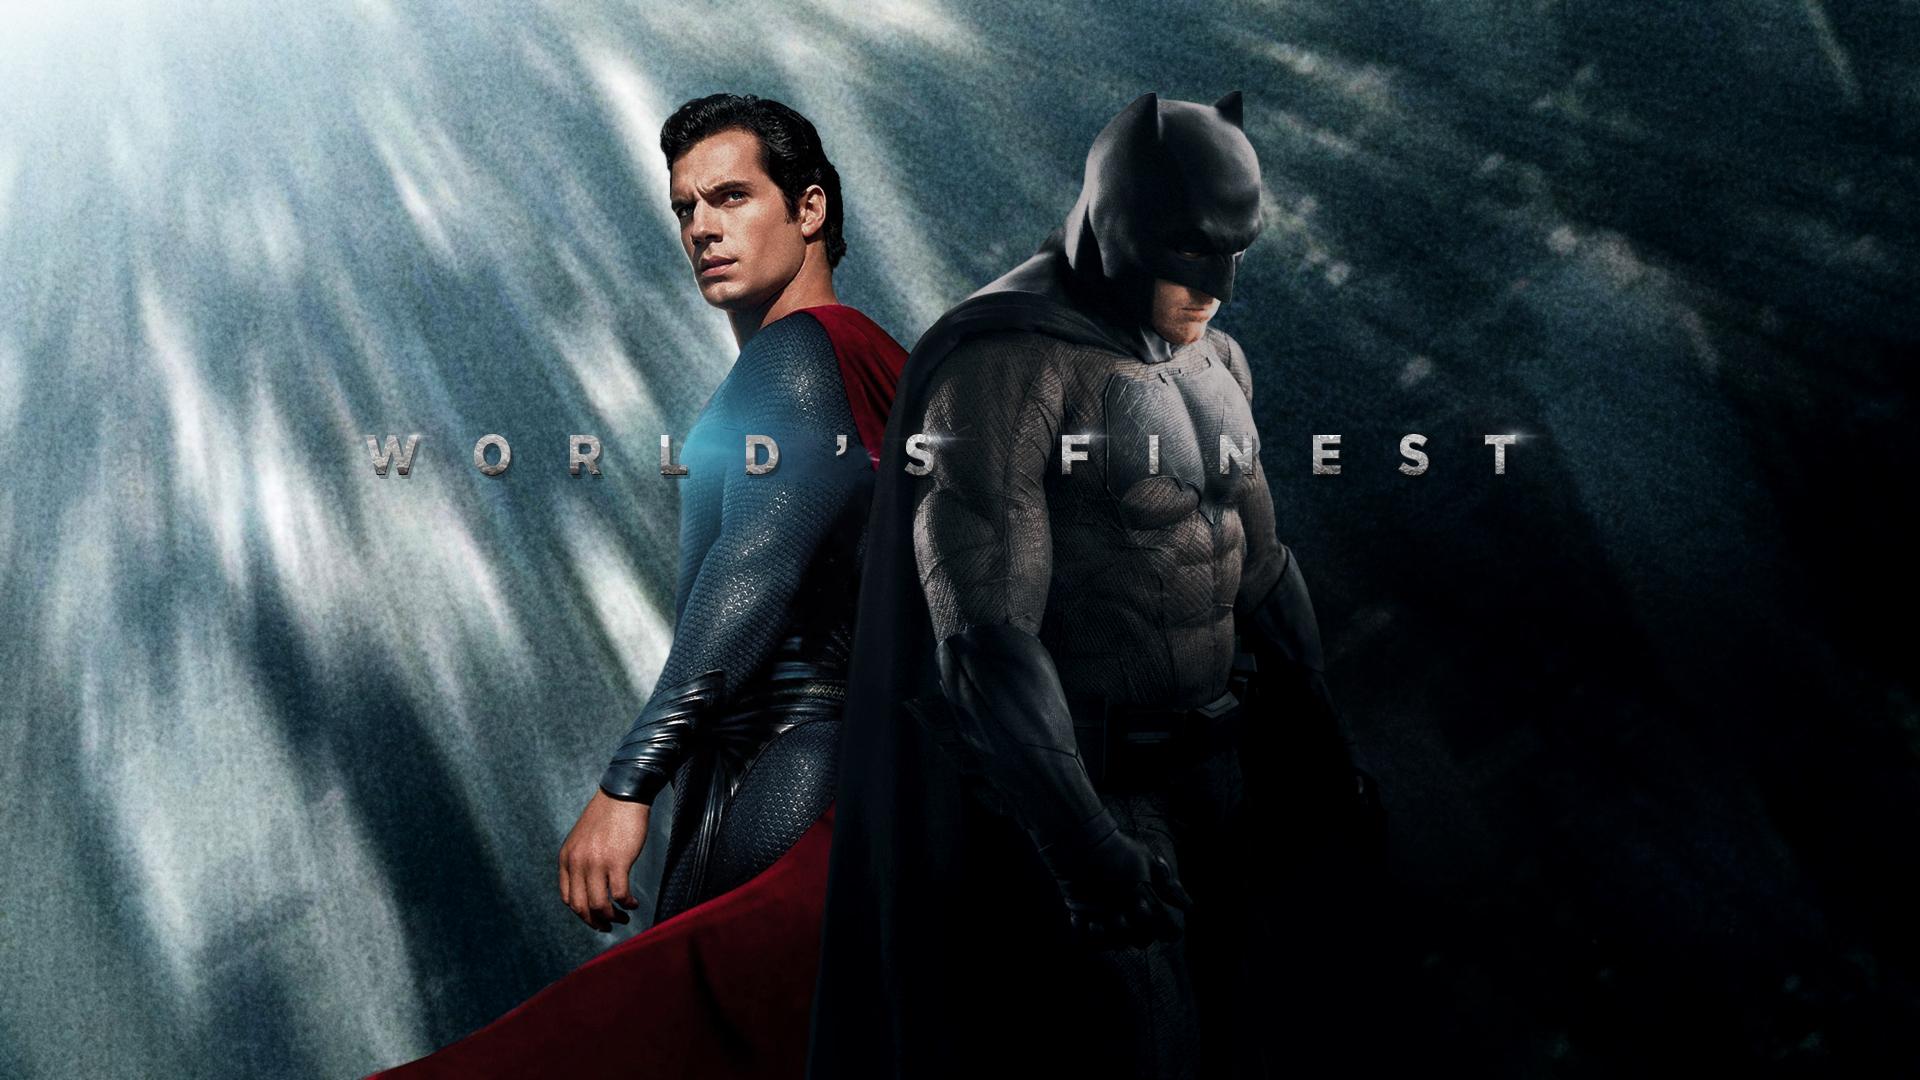 download Batman Vs Superman Worlds Finest wallpaper 1920x1080